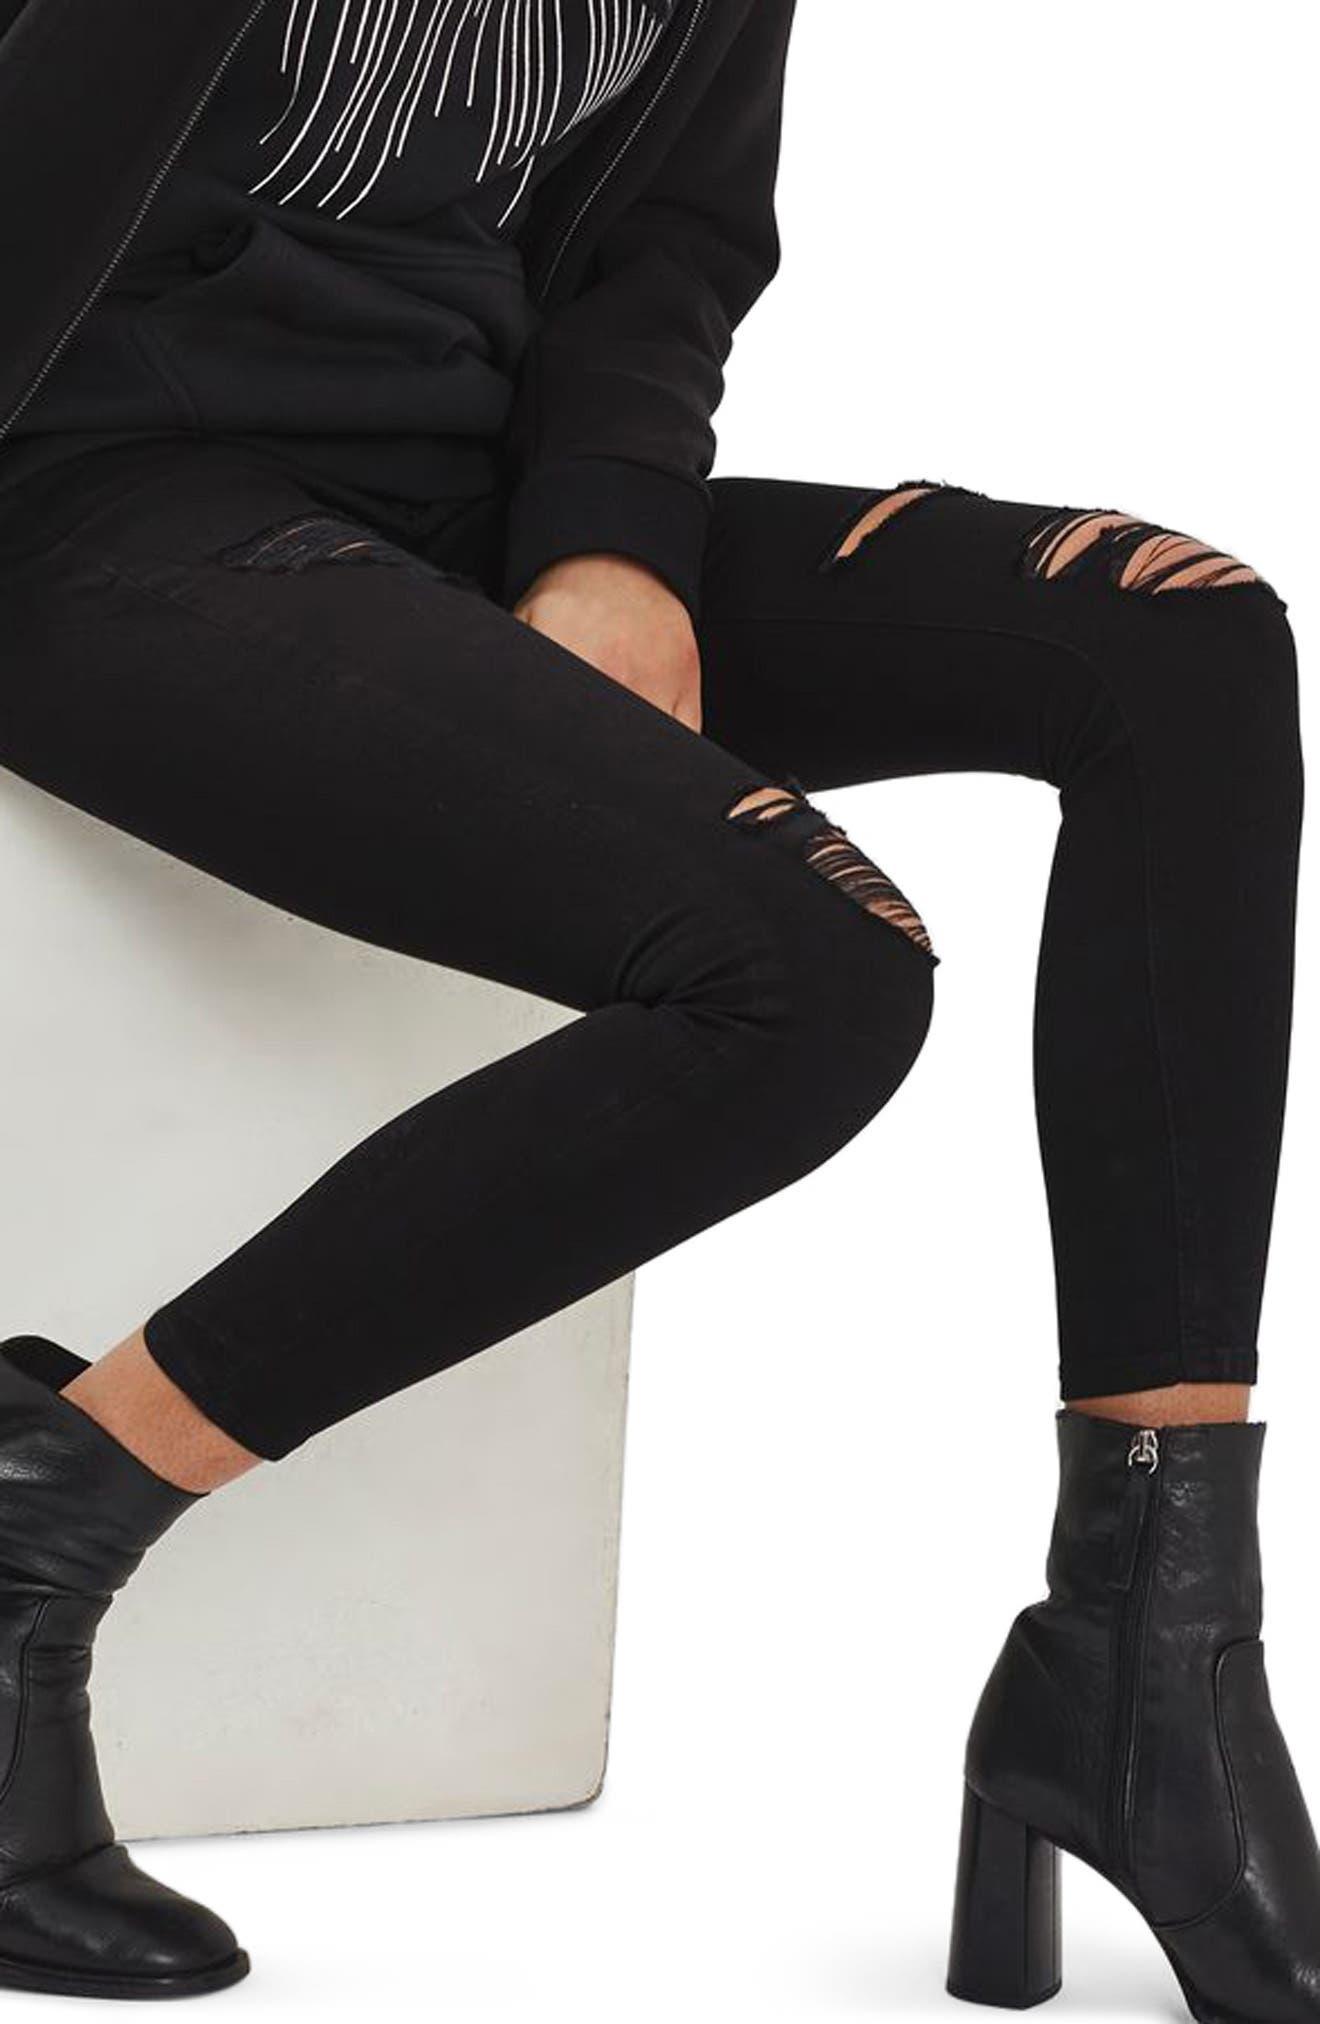 Leigh Super Rip Skinny Jeans,                             Alternate thumbnail 3, color,                             Black